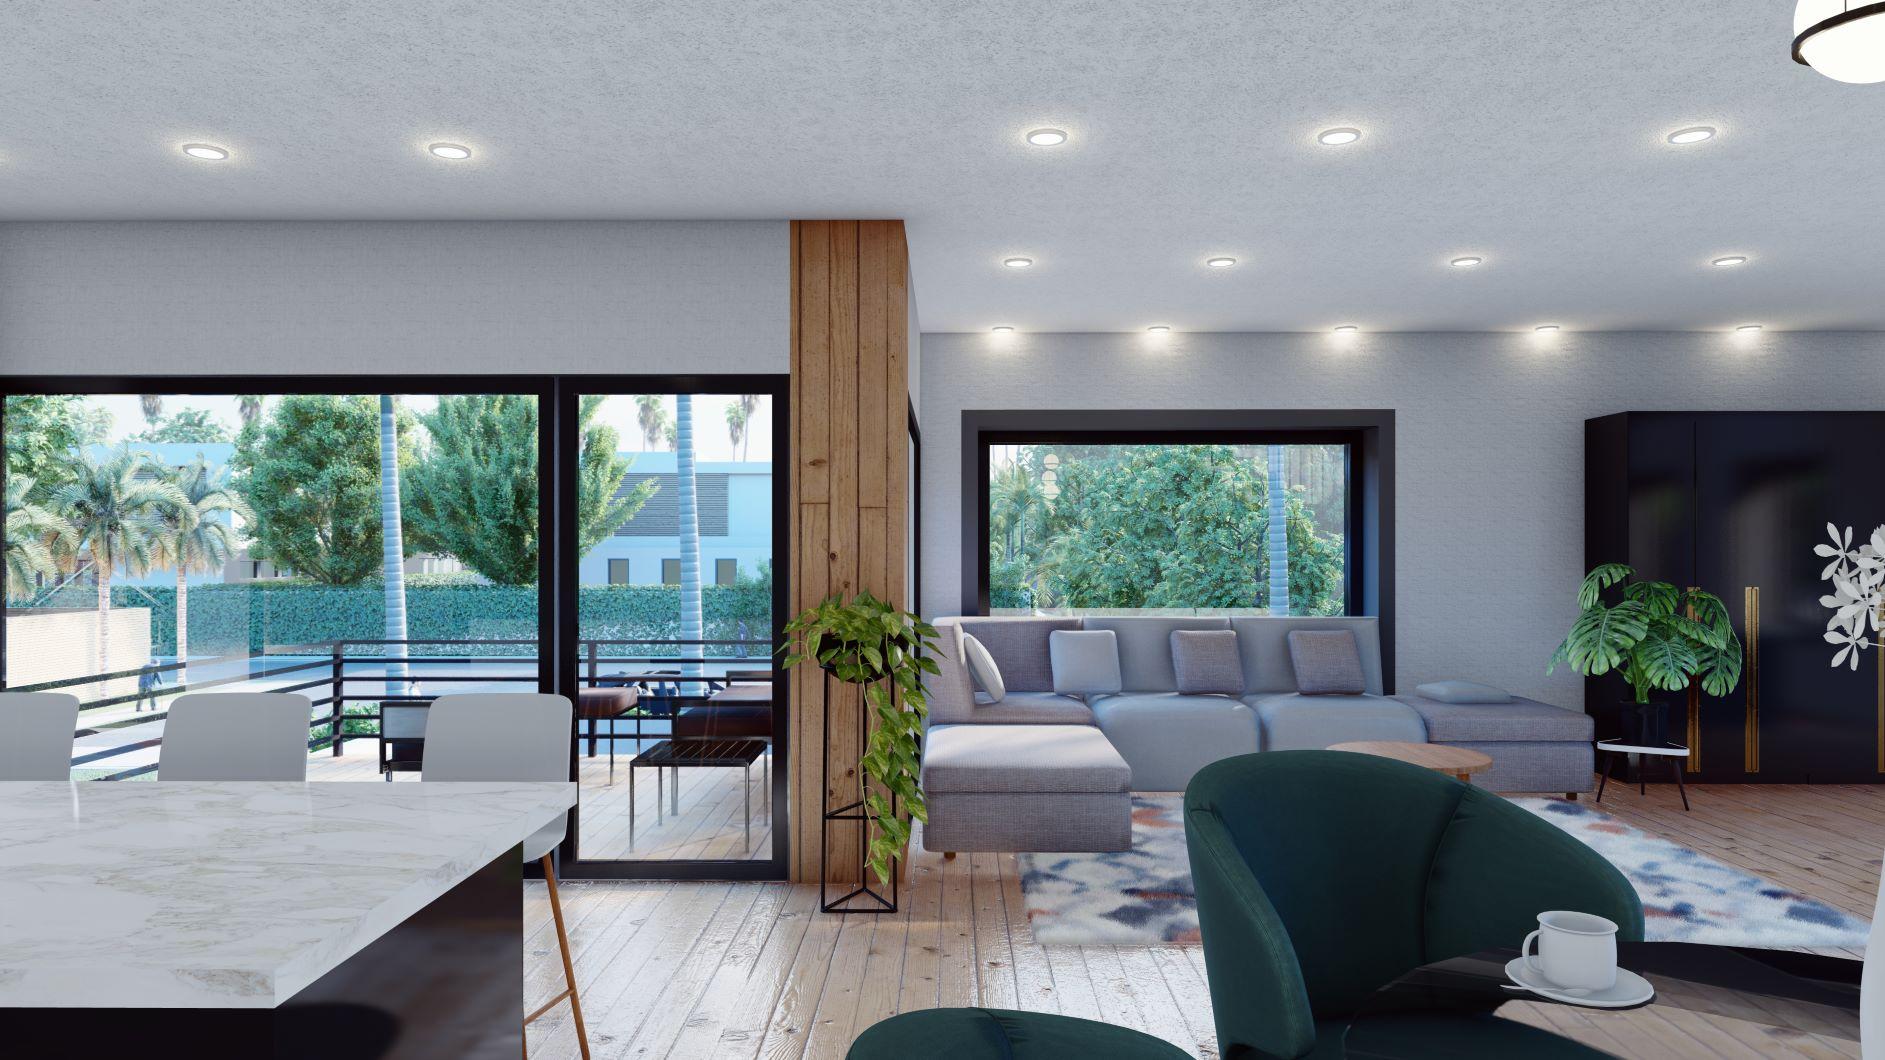 Appartement 3 chambres à vendre à Heisdorf